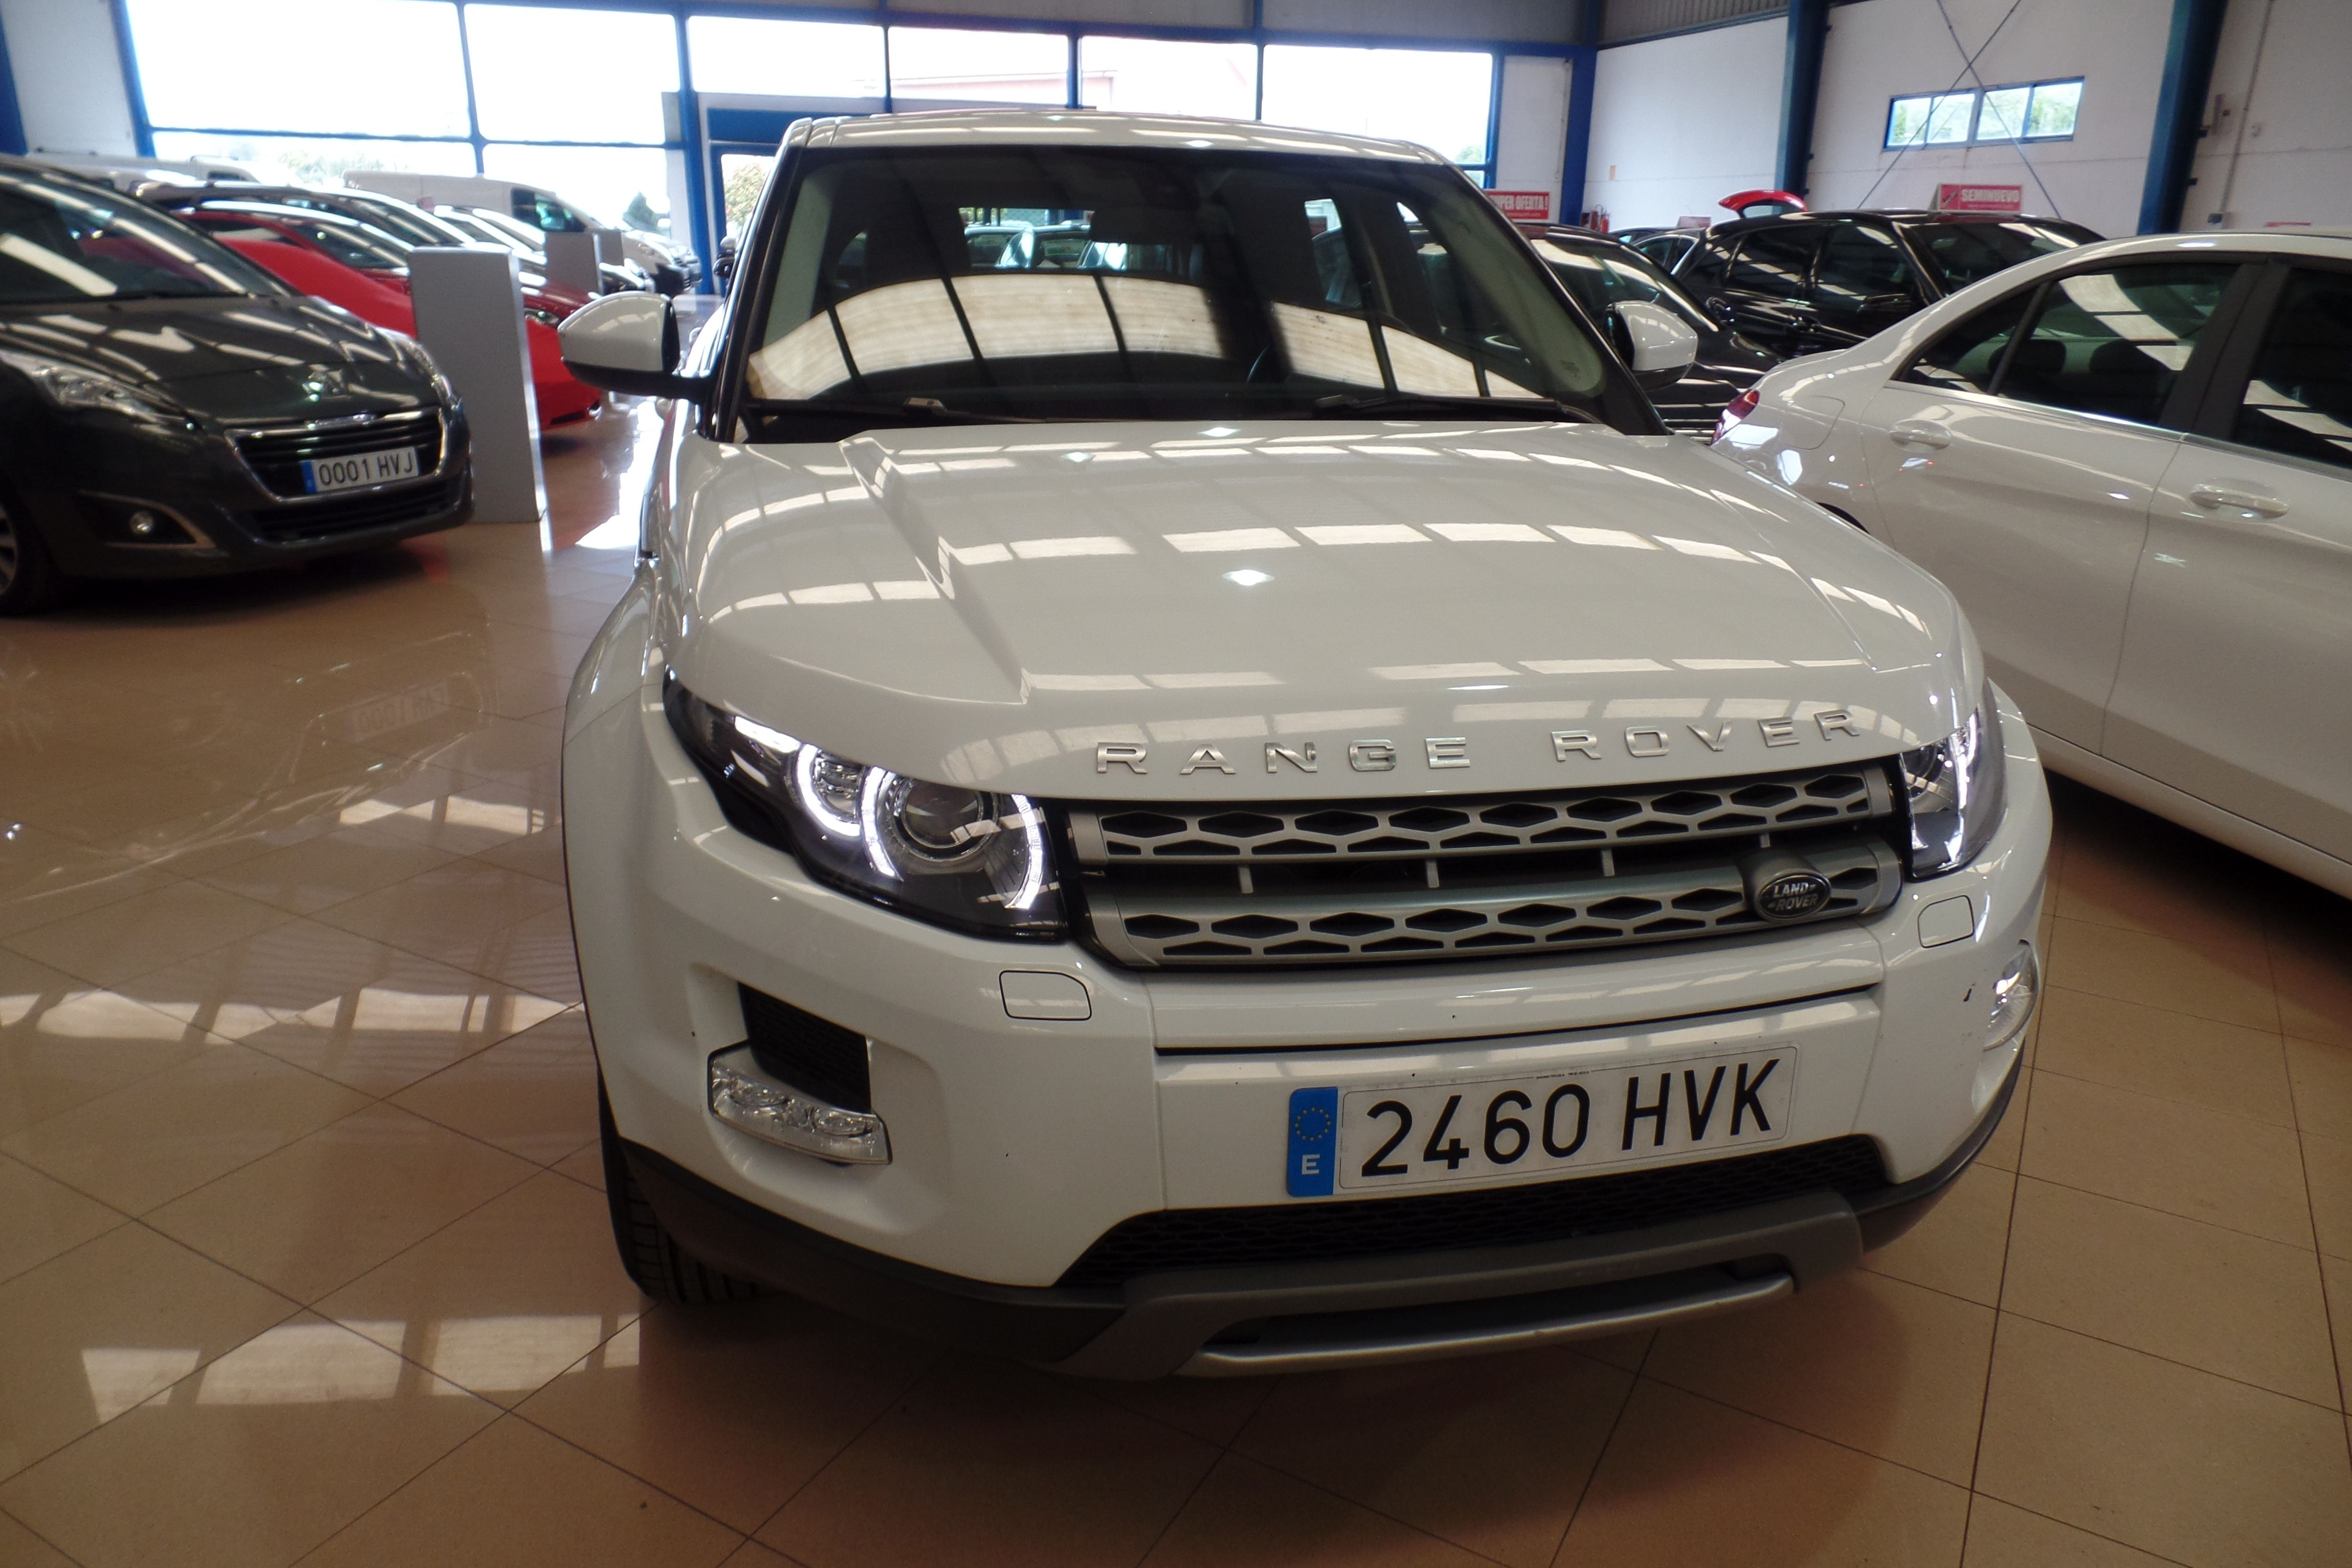 LAND-ROVER Range Rover Evoque 2.2L eD4 150CV 4×2 Pure (2460HVX): Servicios Peugeot de Senra Sport